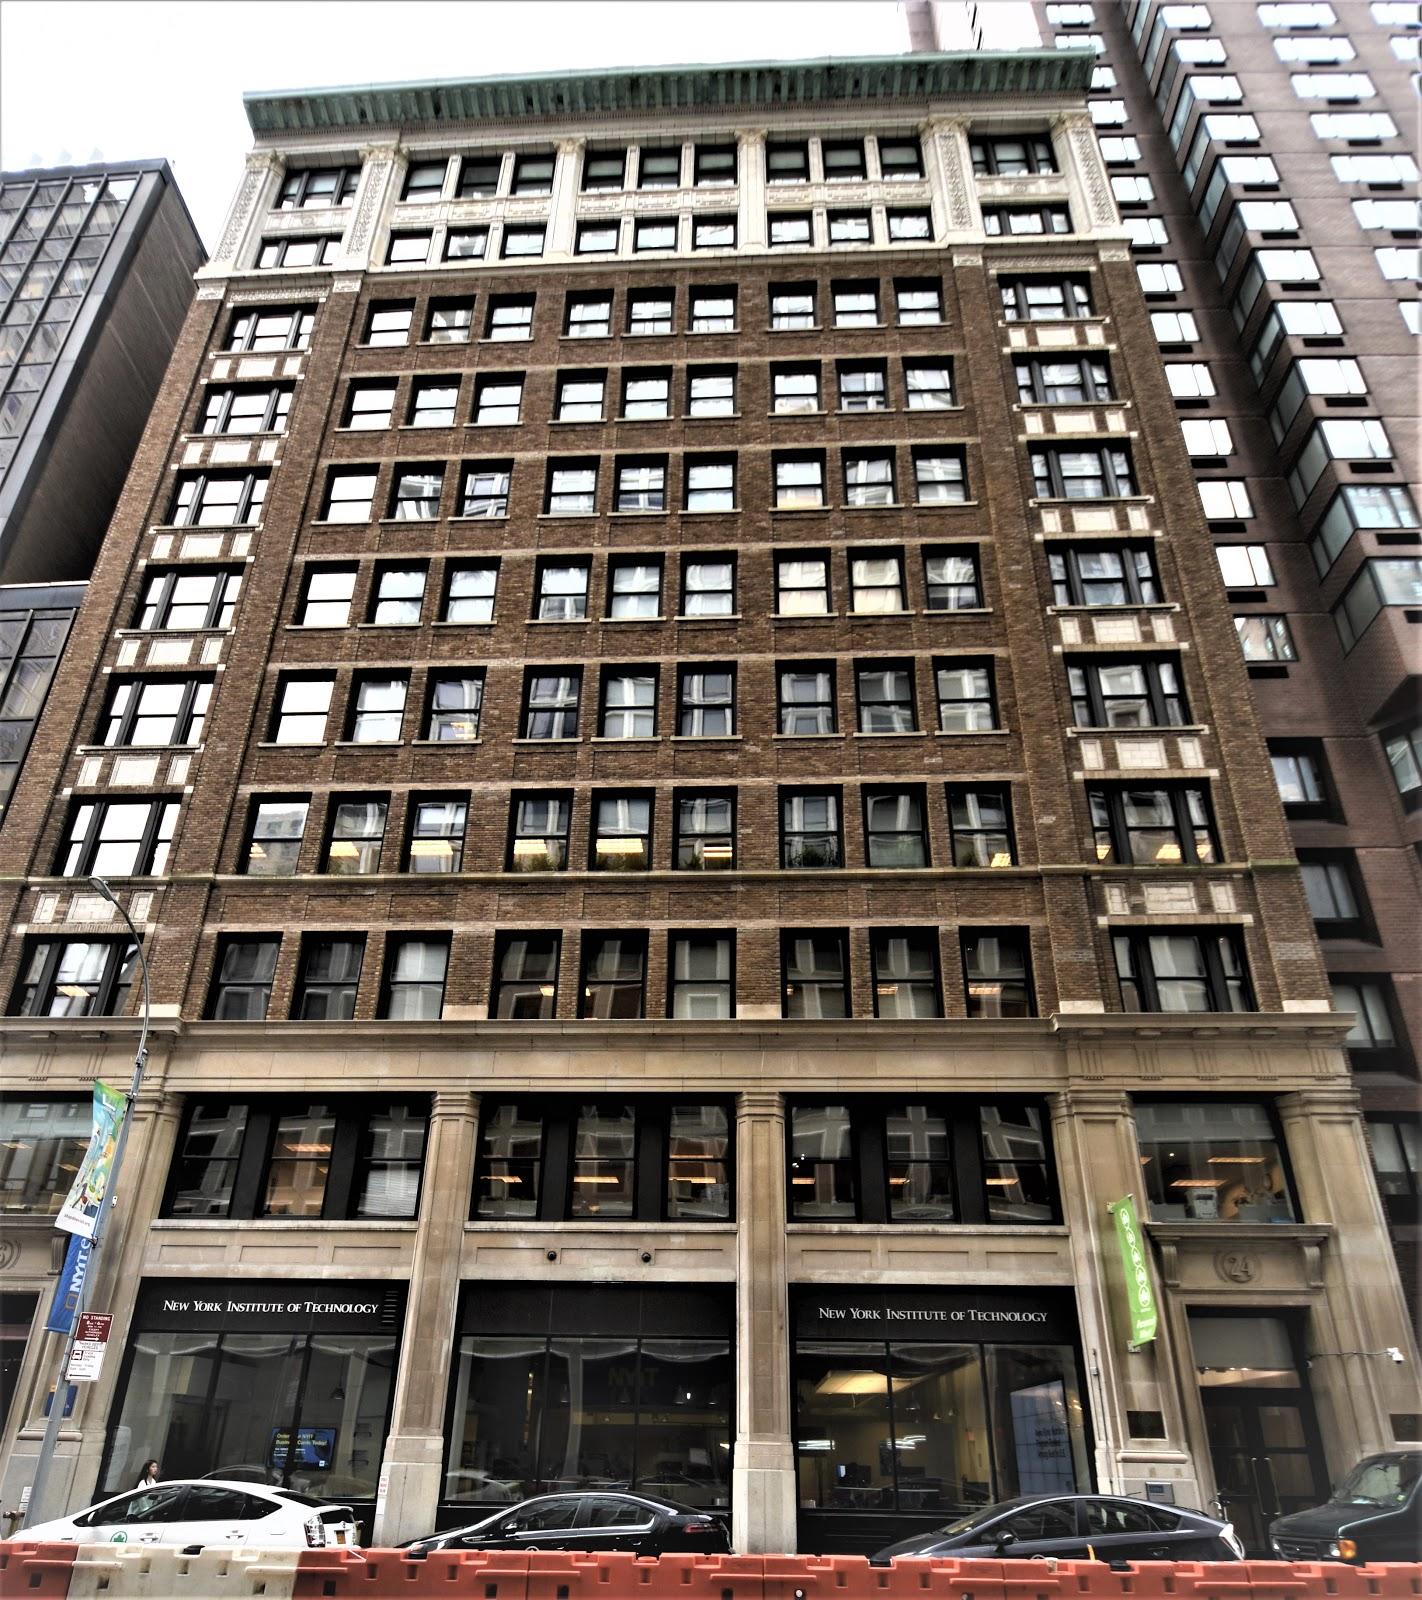 Streets In Manhattan: Daytonian In Manhattan: The Locomobile Company Building